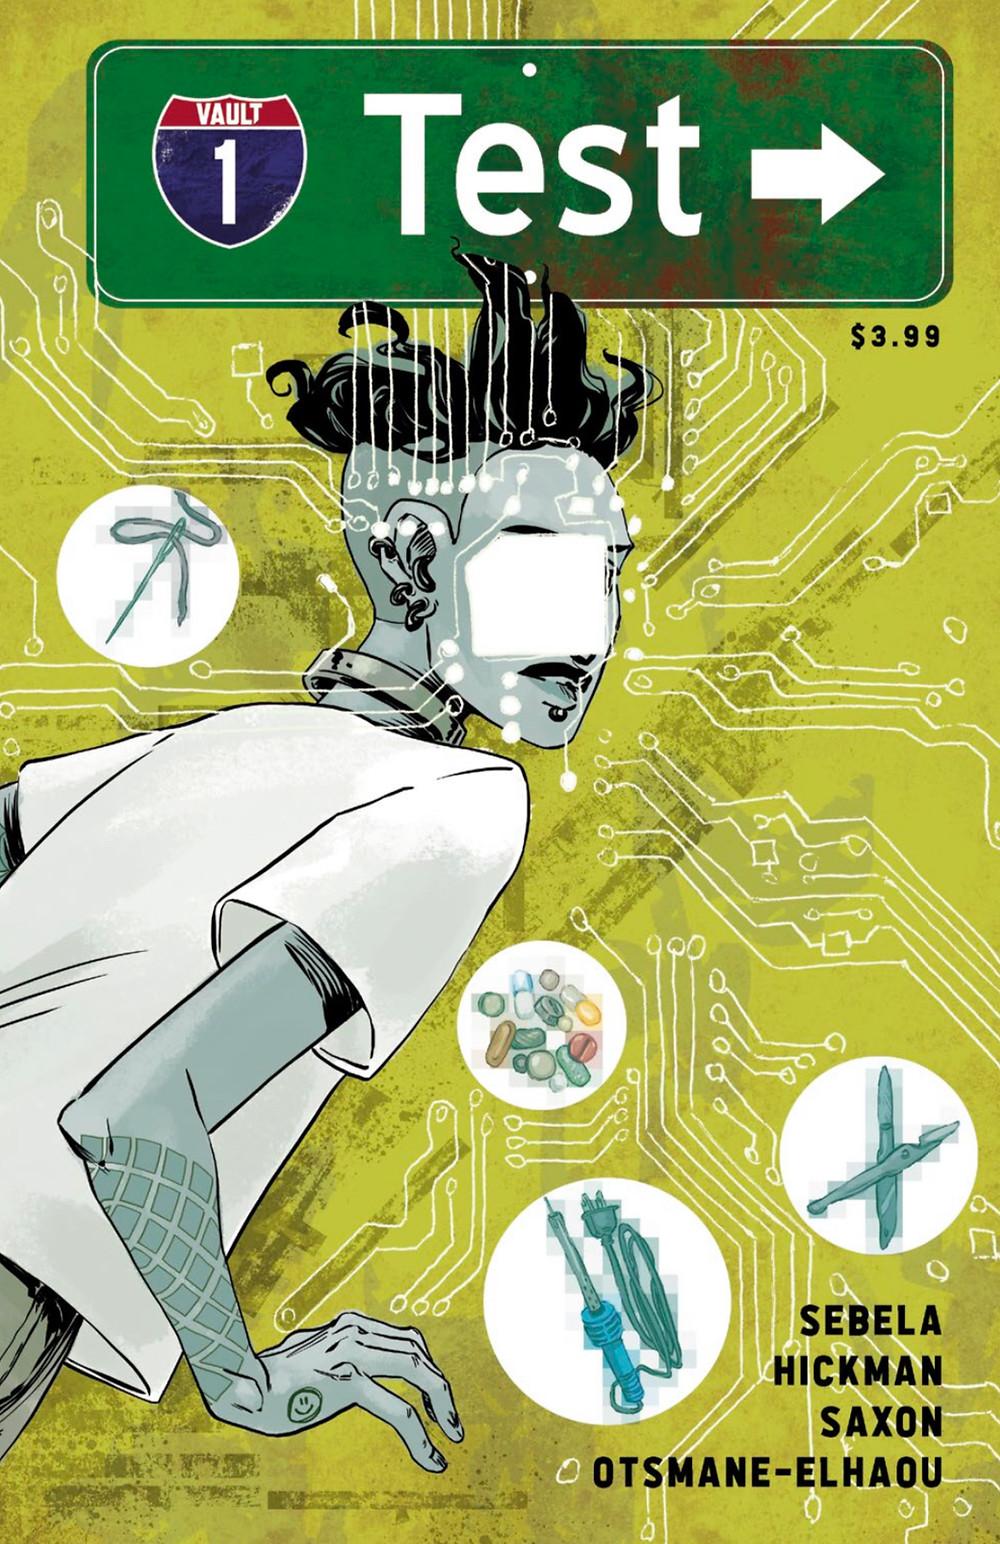 Test, issue #1, cover, Vault Comics, Sebela/Hickman